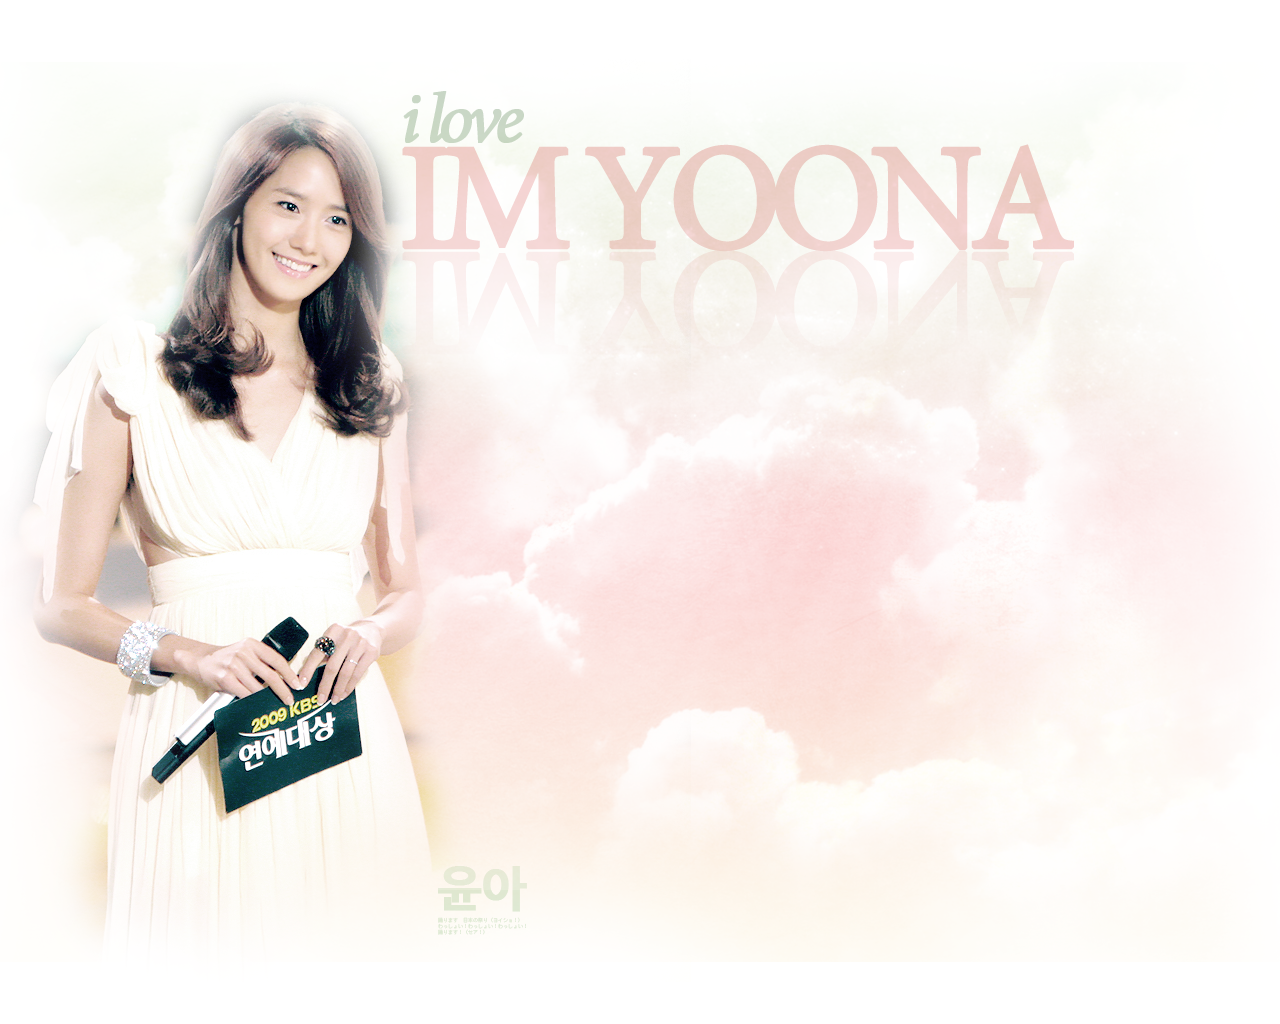 [PICS] Yoona Wallpaper Collection Snsd_yoona_wallpaper_8_by_tifflebear-d2yzhs6